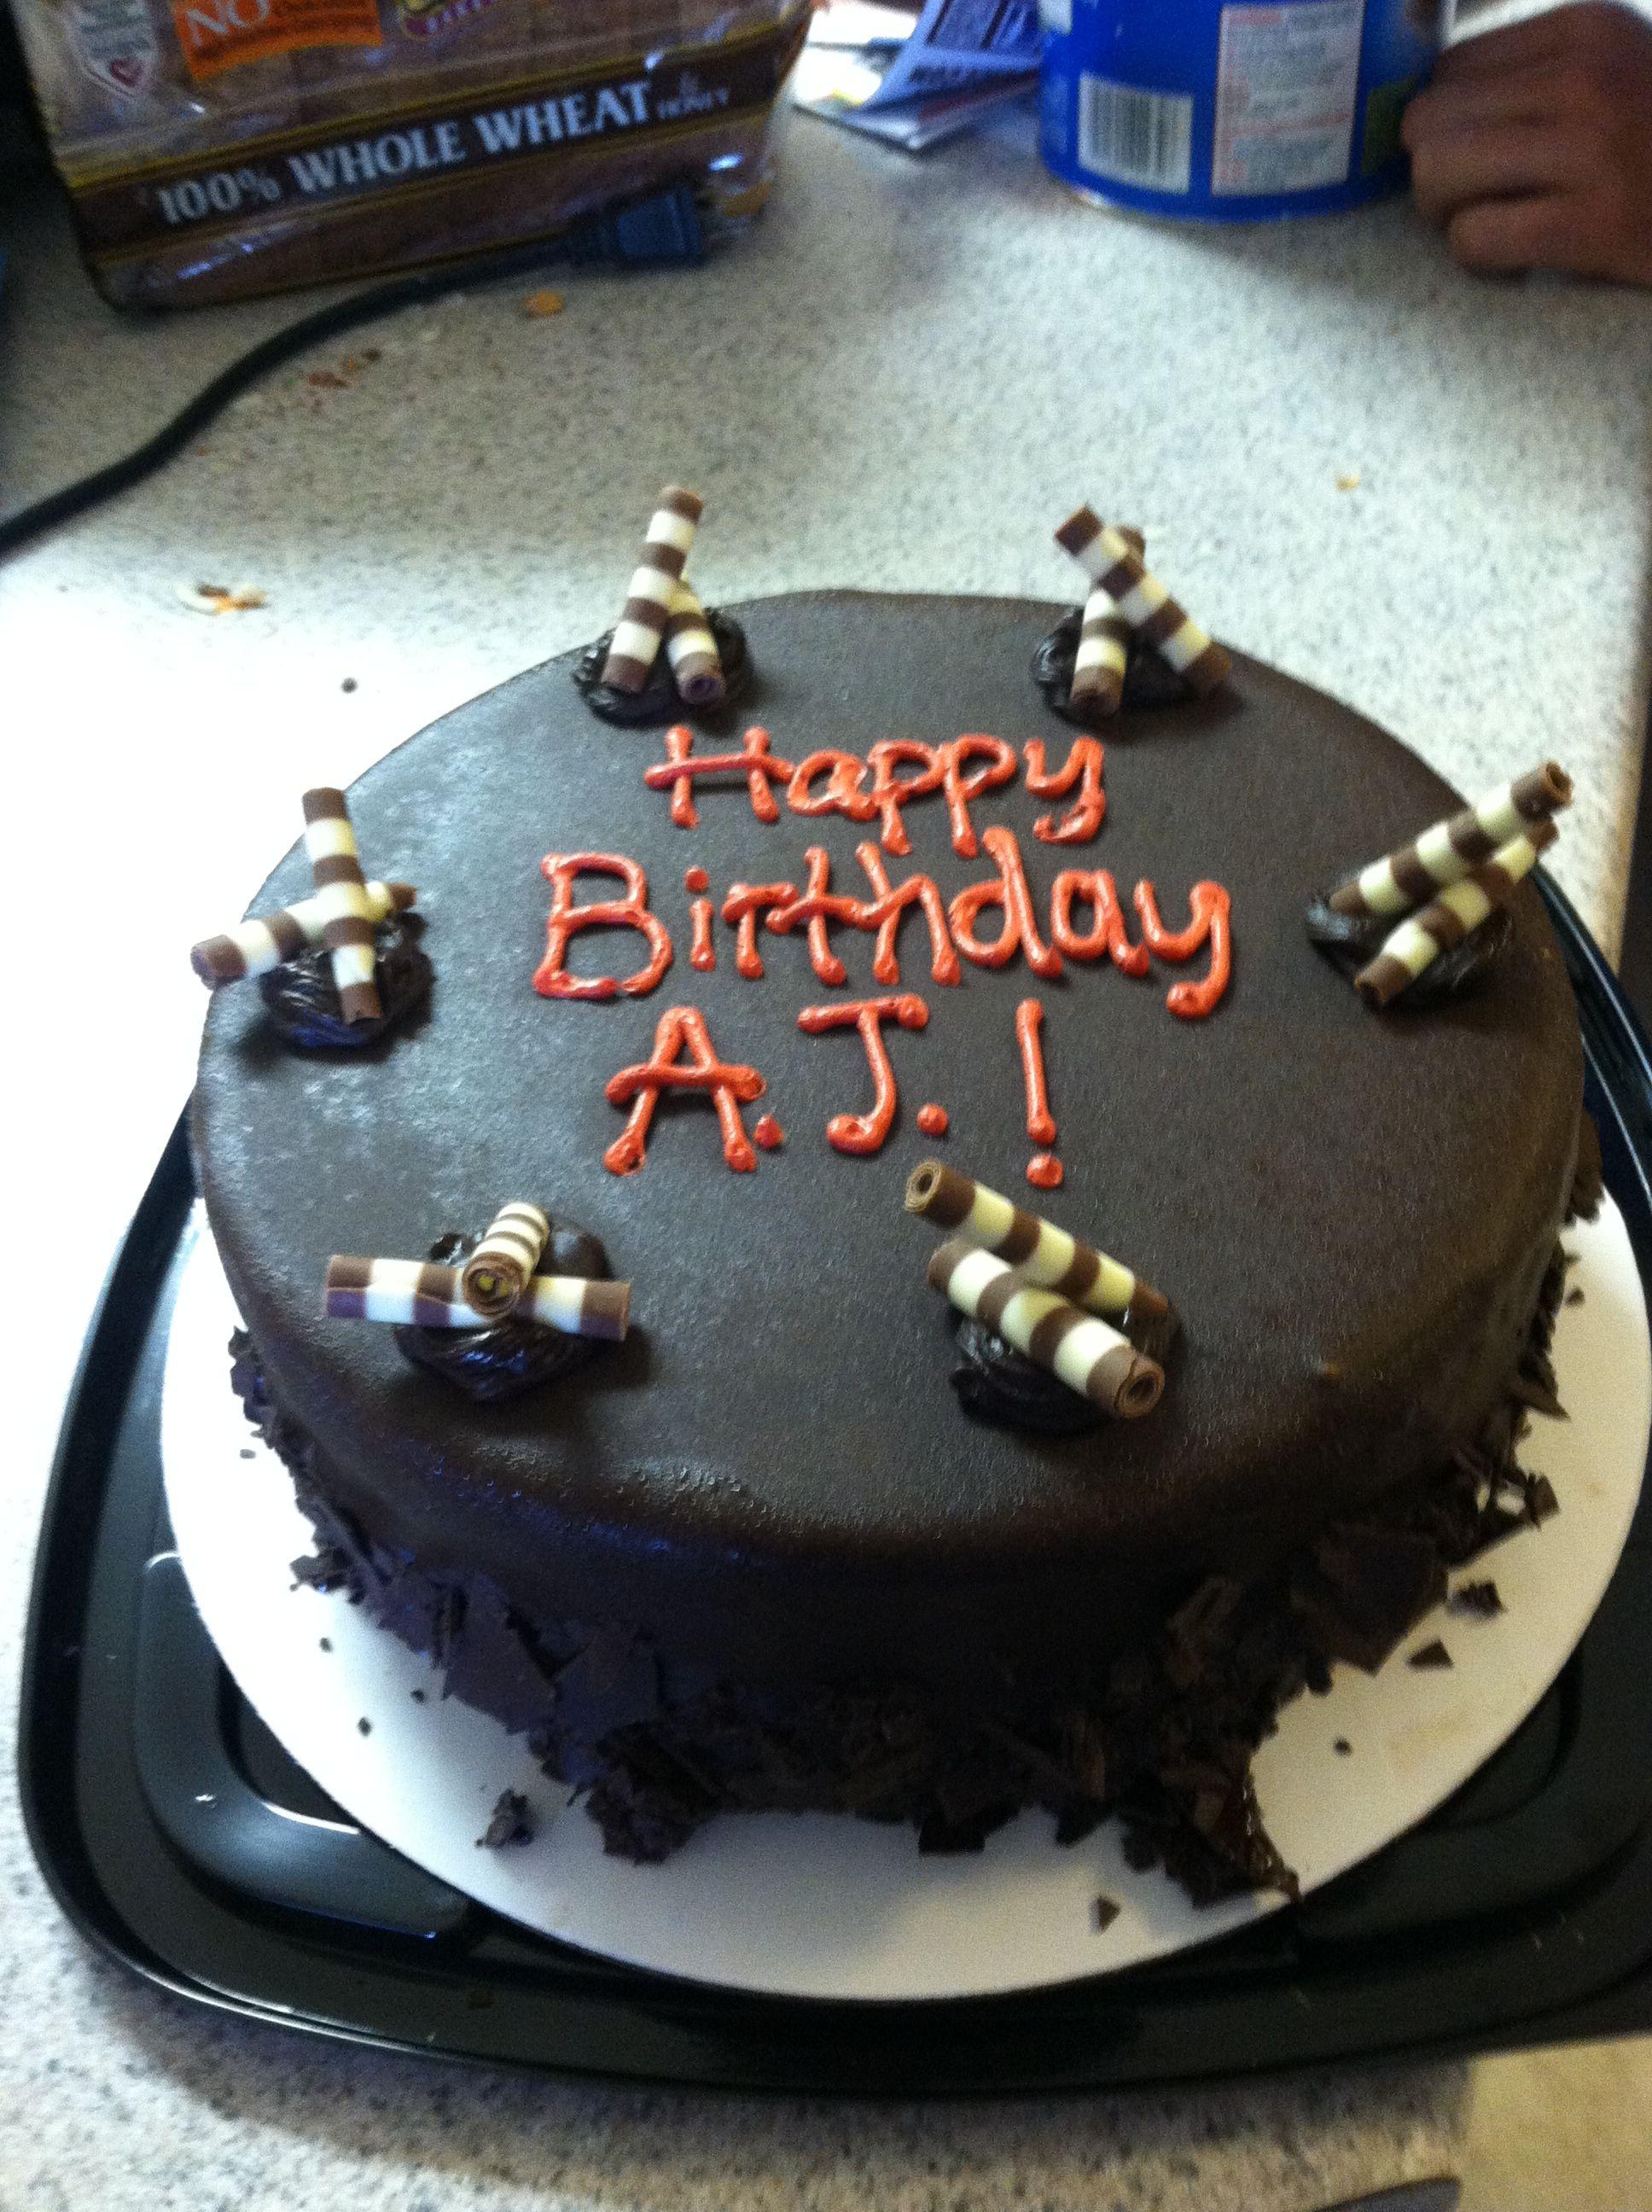 My Cold Stone birthday cake